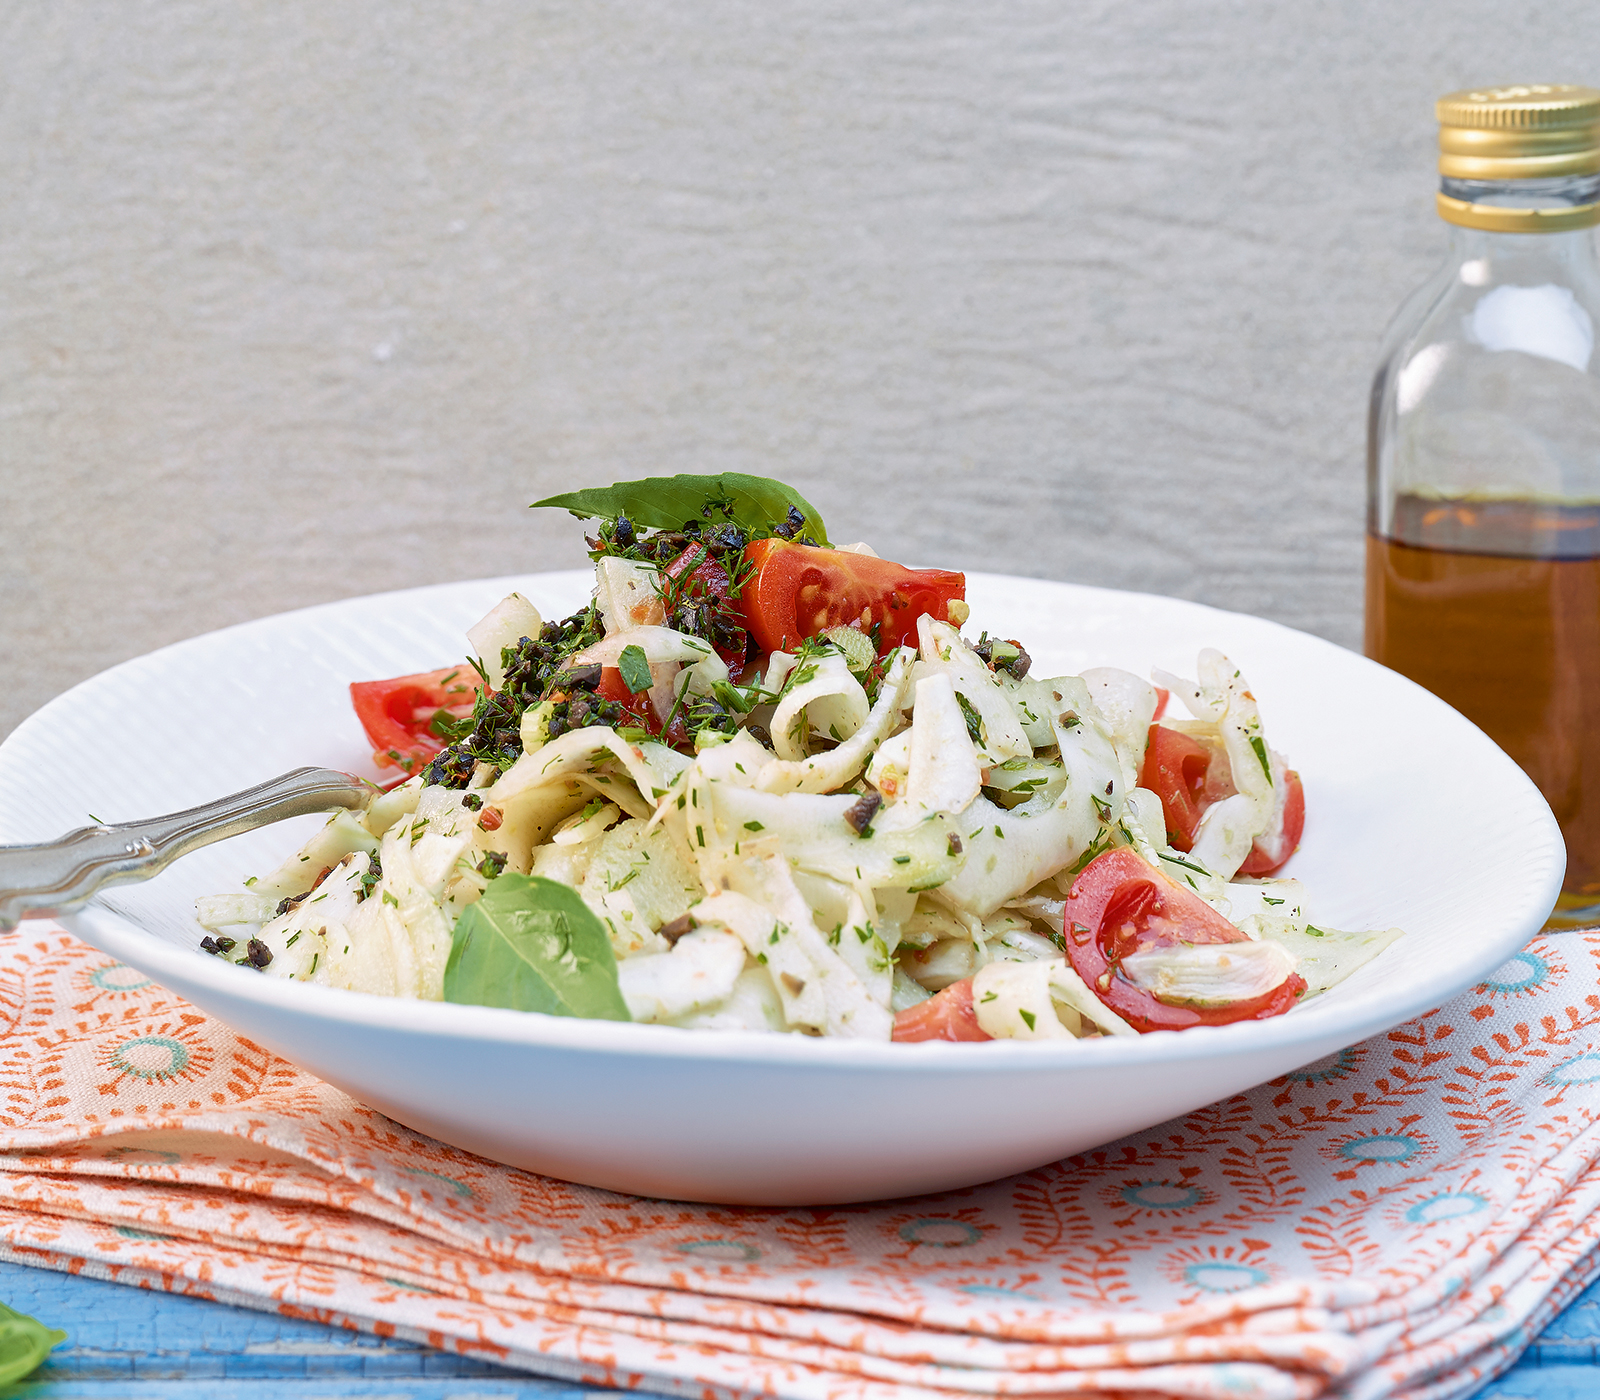 tomaten fenchel salat mit olivendressing annemarie wildeisen 39 s kochen. Black Bedroom Furniture Sets. Home Design Ideas